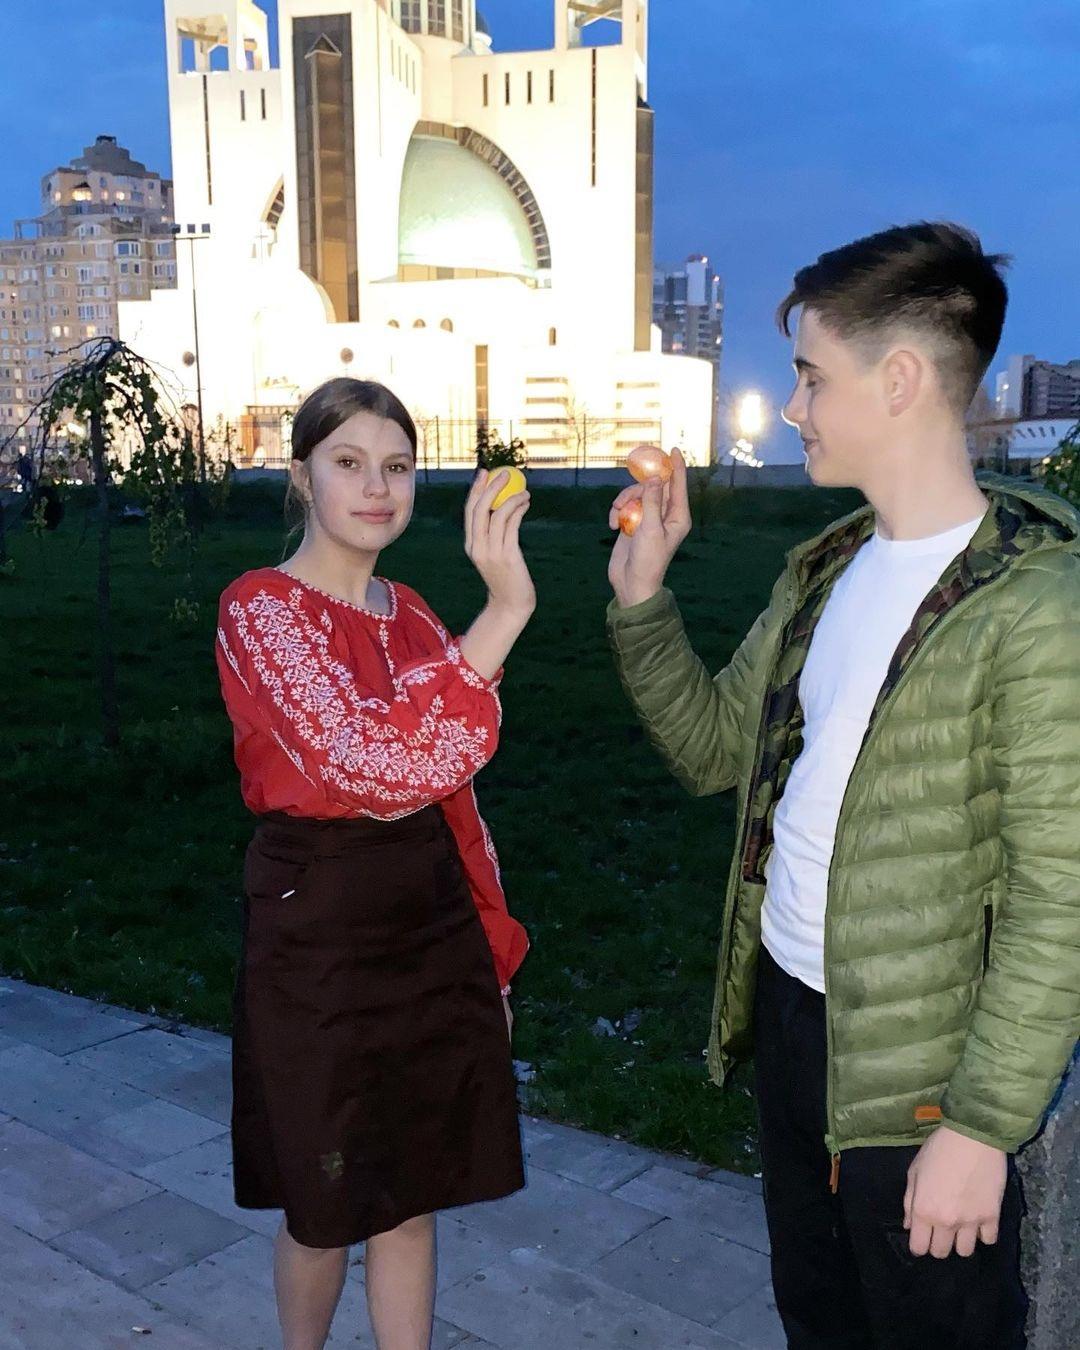 украинские звезды пасха 2021 как отметили паски крашанки декор лидия таран дочь василина